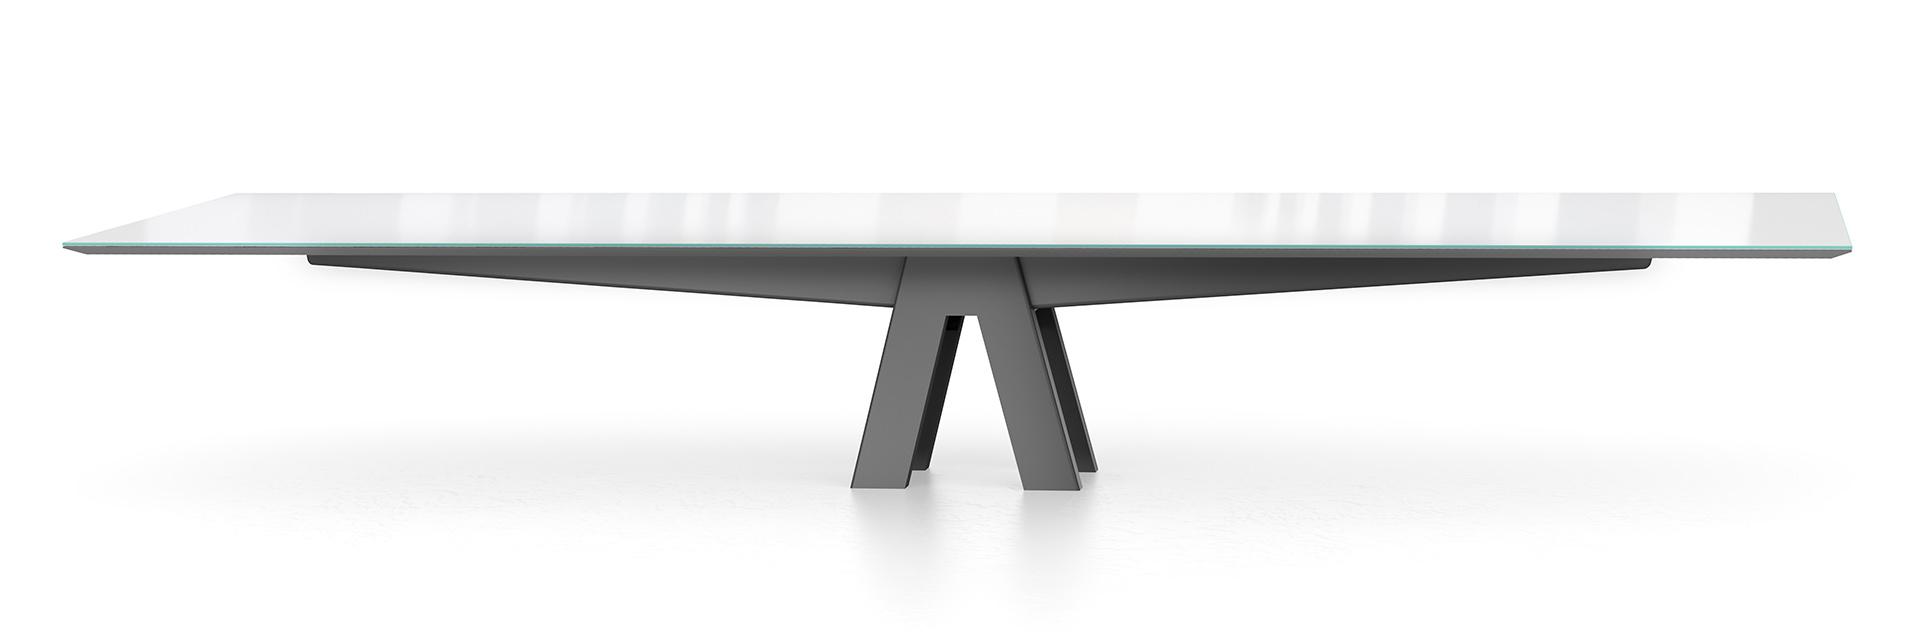 Equilibrium Enwork - 20 foot conference table